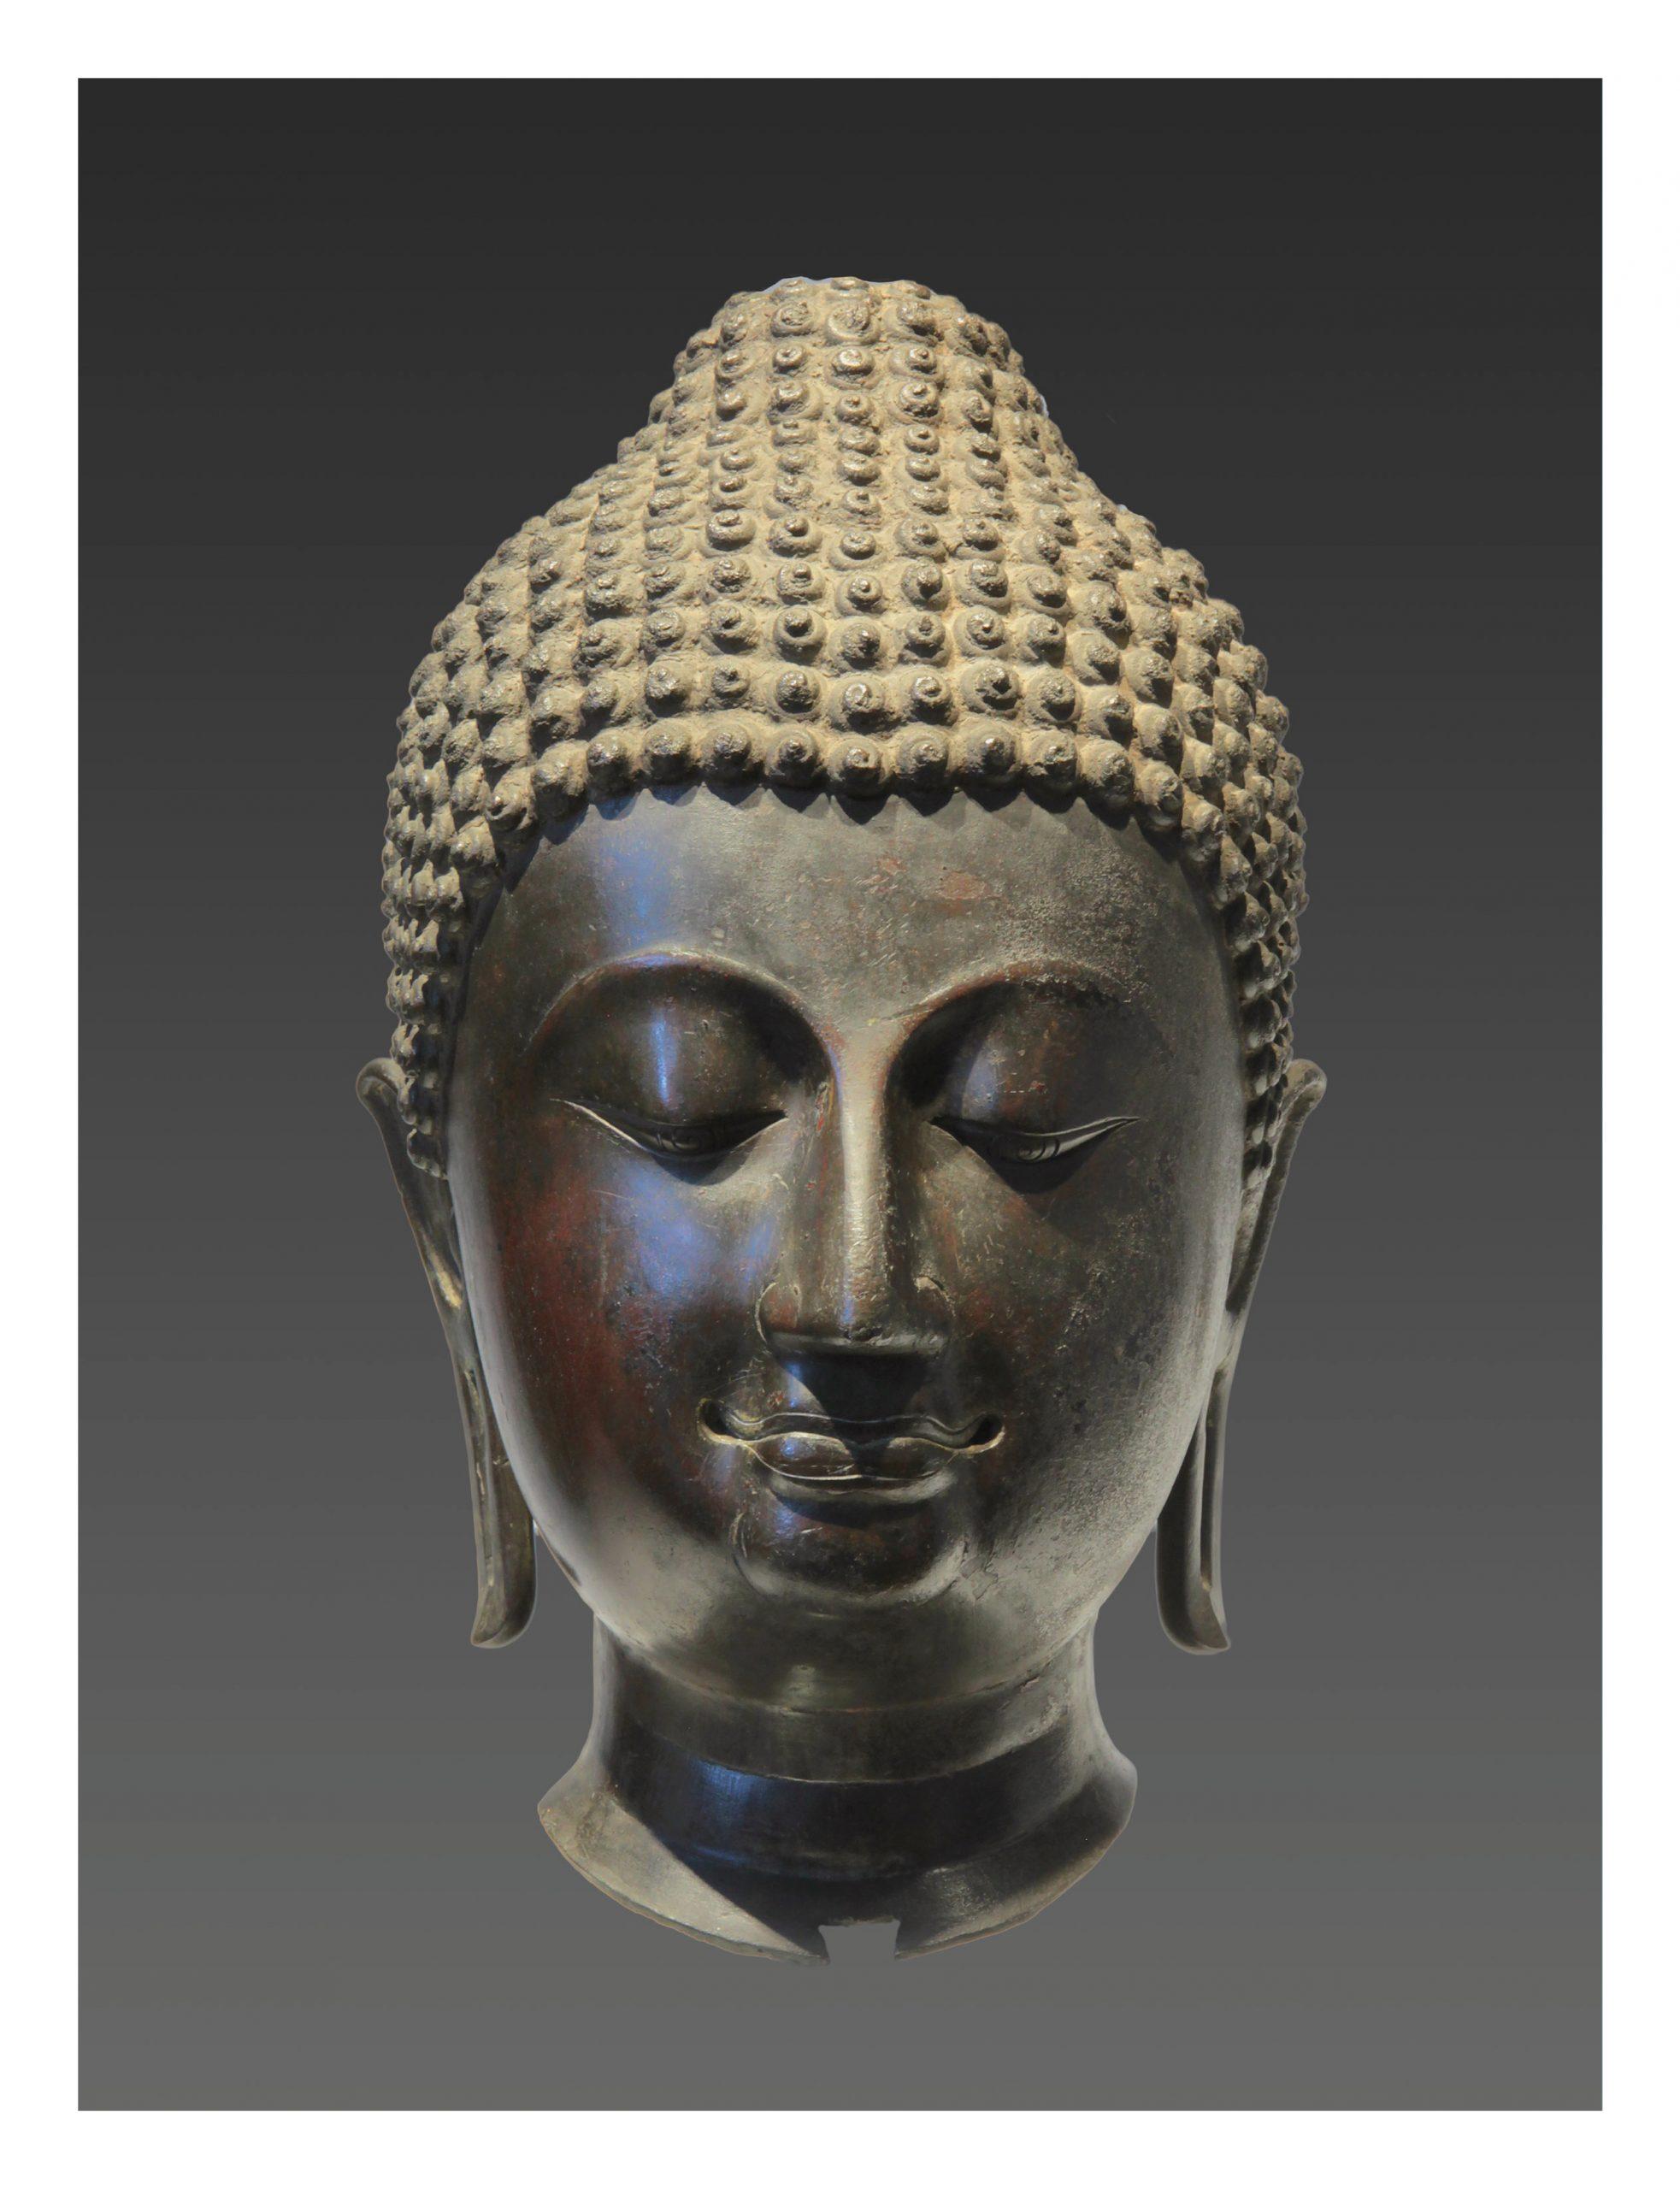 THAILAND, HEAD OF BUDDHA SAKYAMUNI, LAN NA KINGDOM, 15TH CENTURY, H.: 40CM